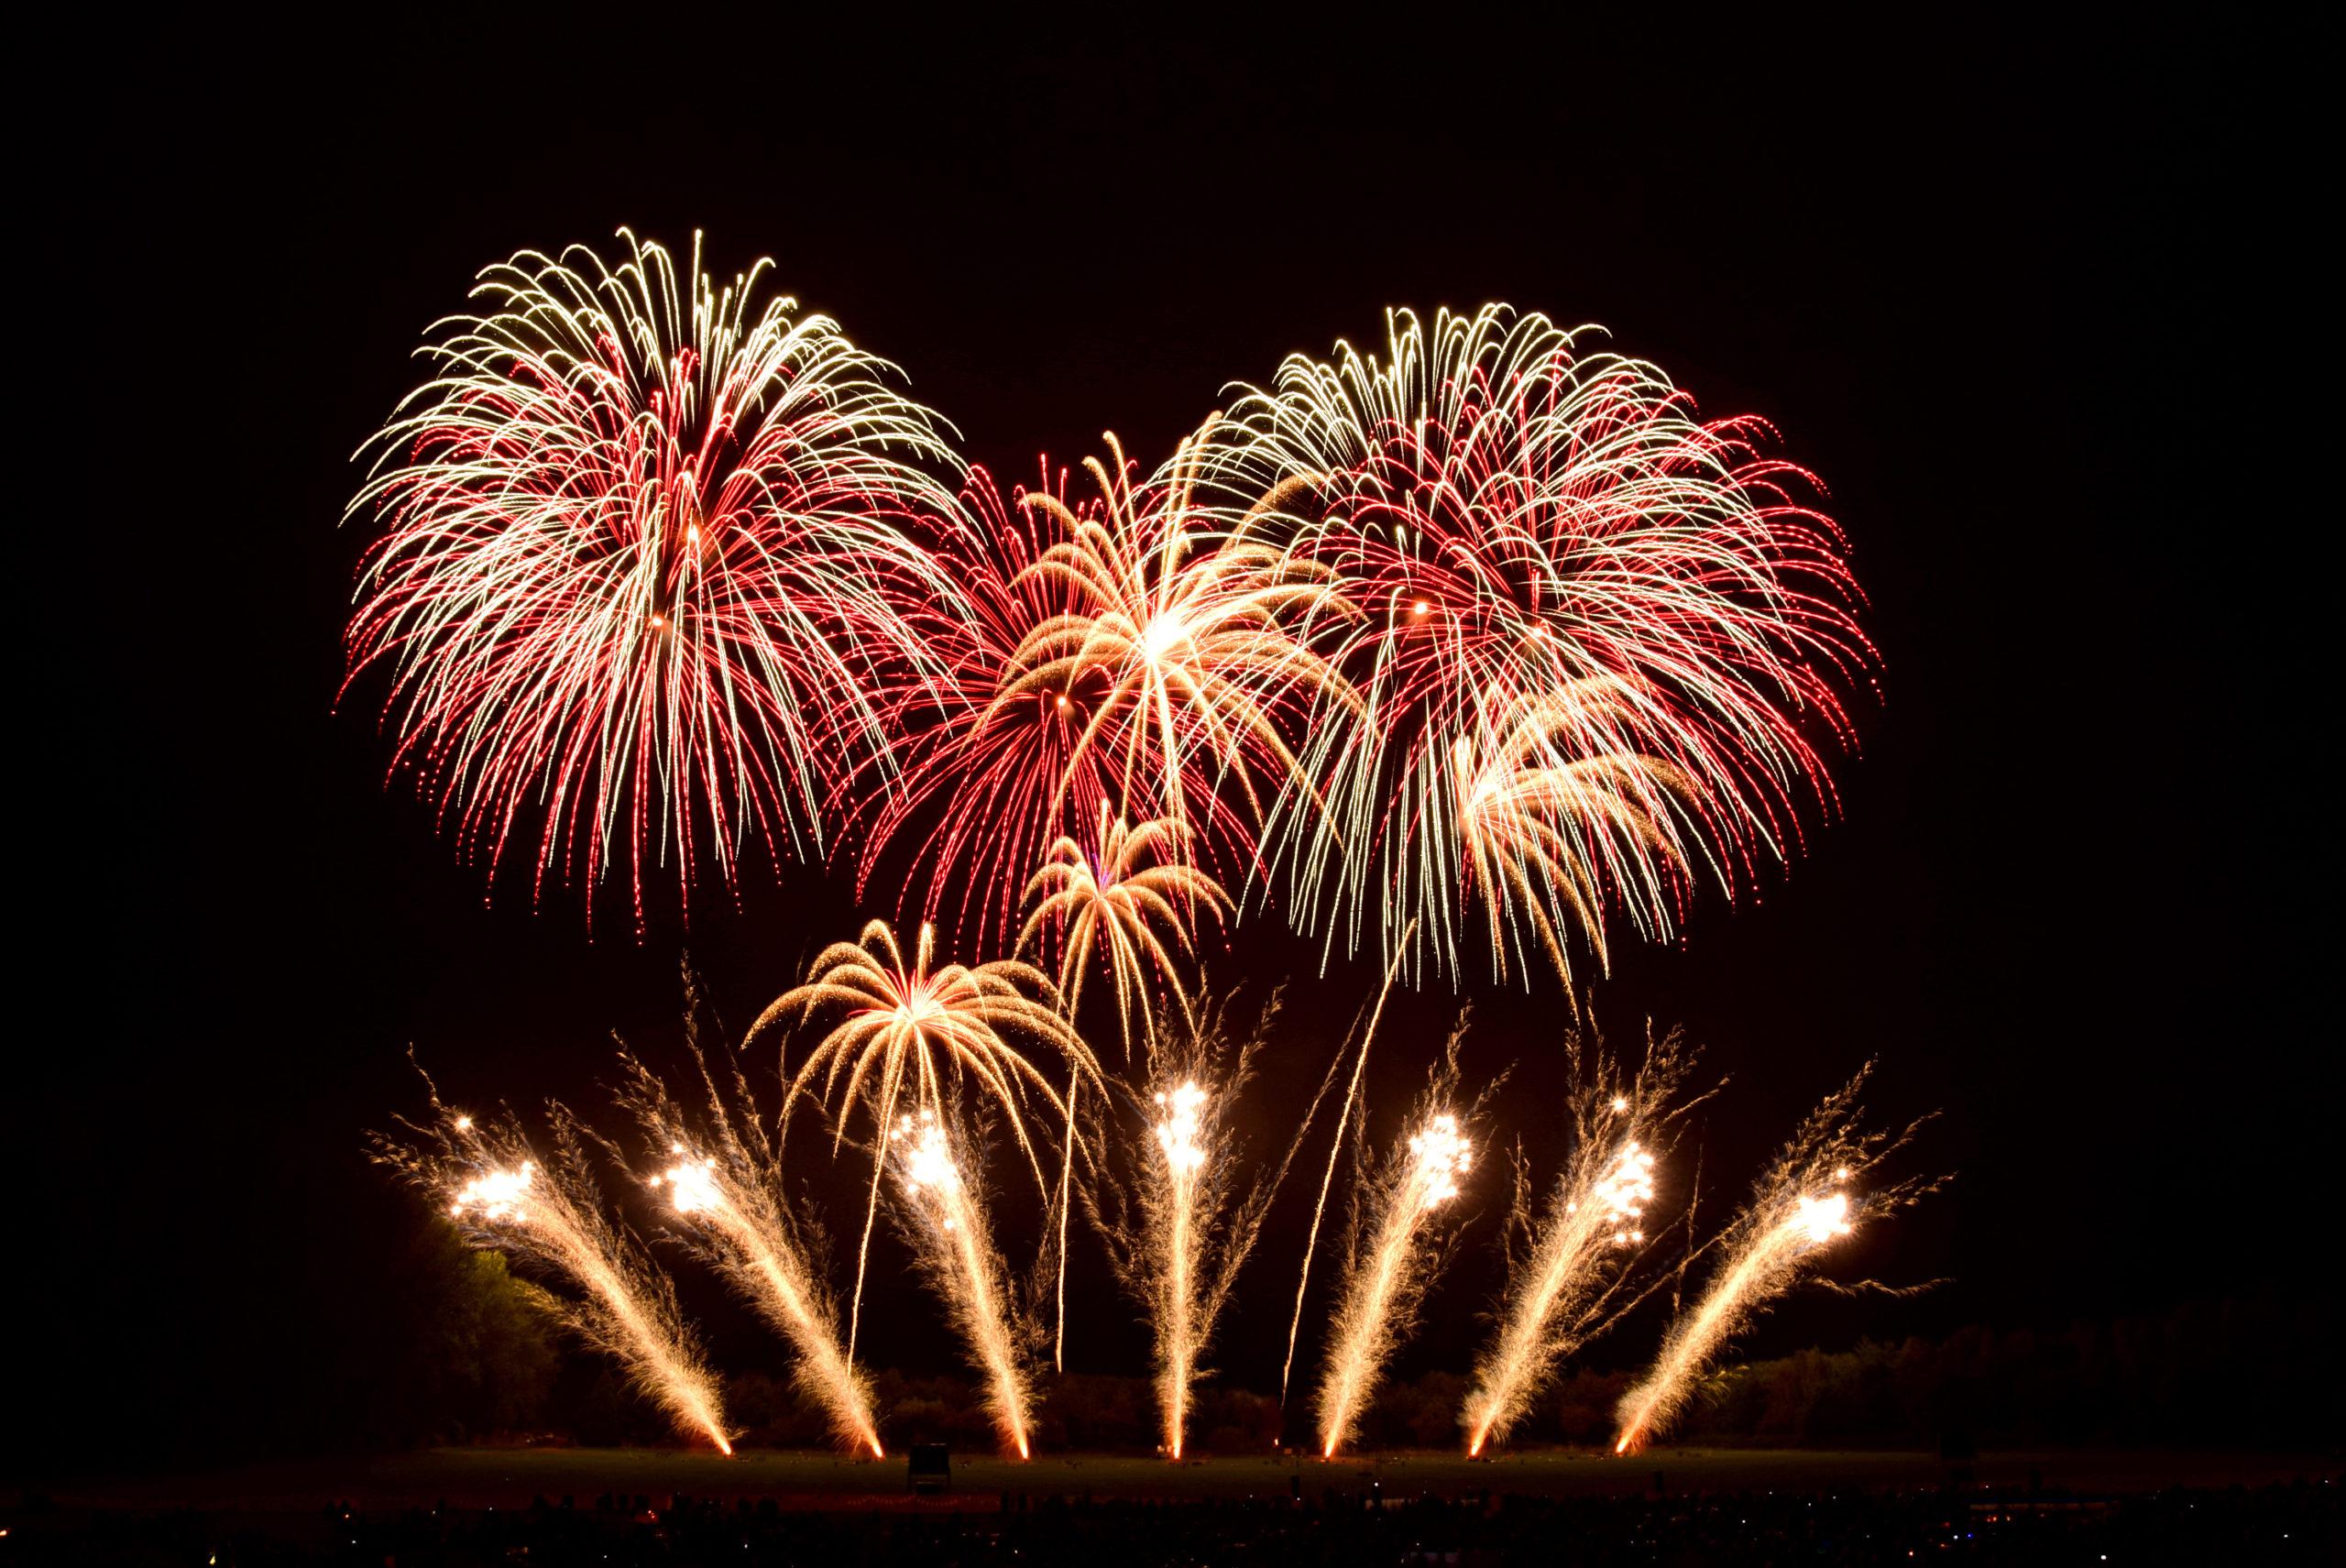 Dynamic Fireworks | Fireworks Display | Festival of Fireworks